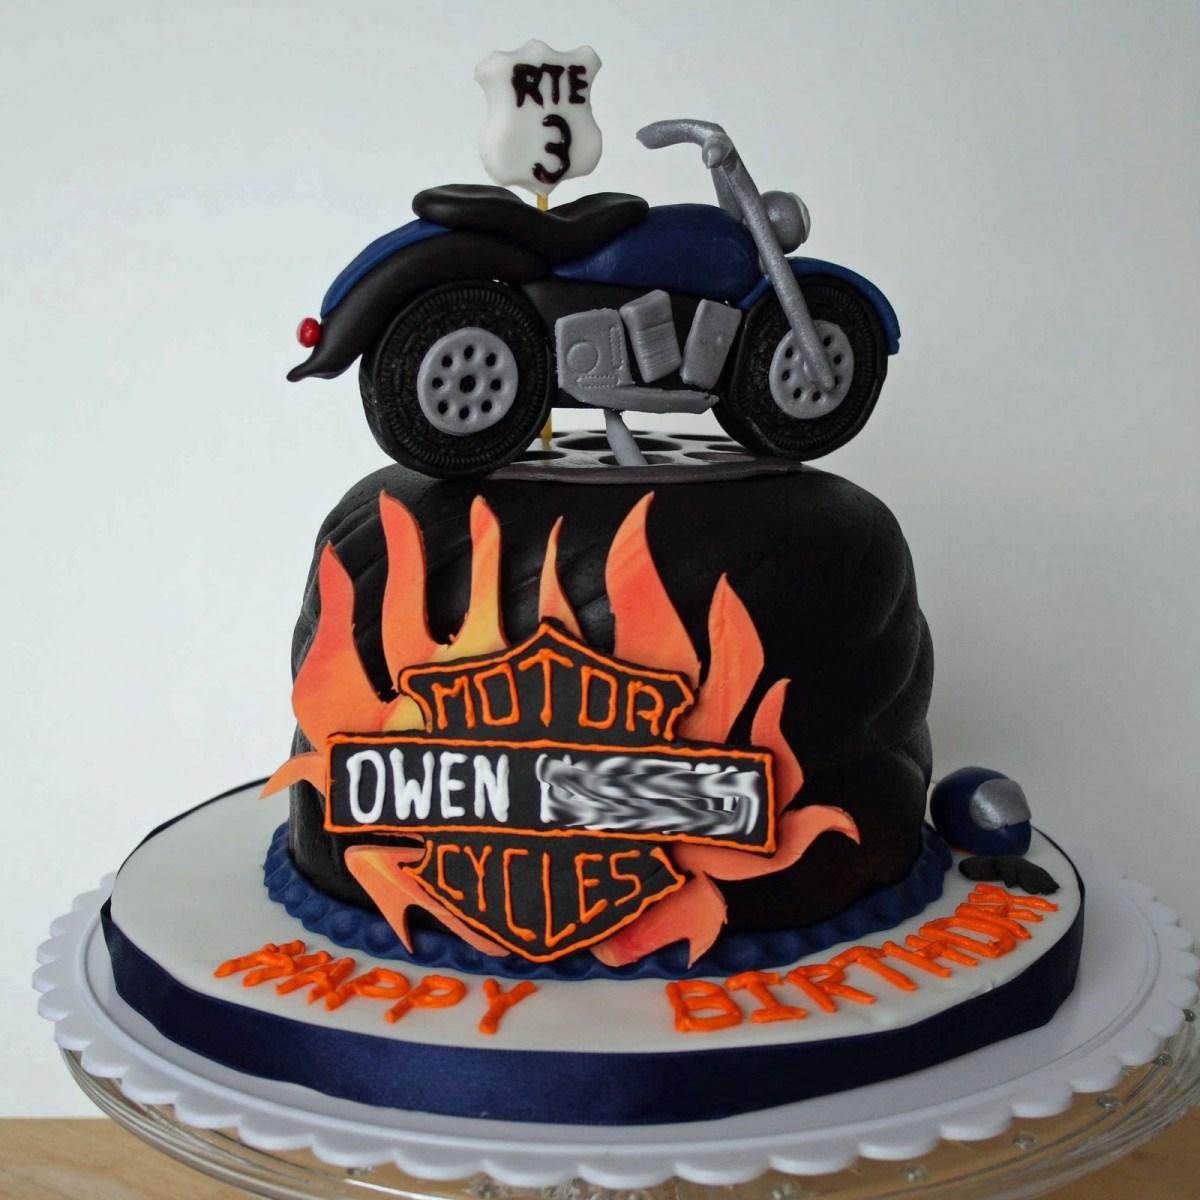 Astounding Motorcycle Birthday Cake All Kinds Of Sugar Motorcycle Birthday Funny Birthday Cards Online Alyptdamsfinfo